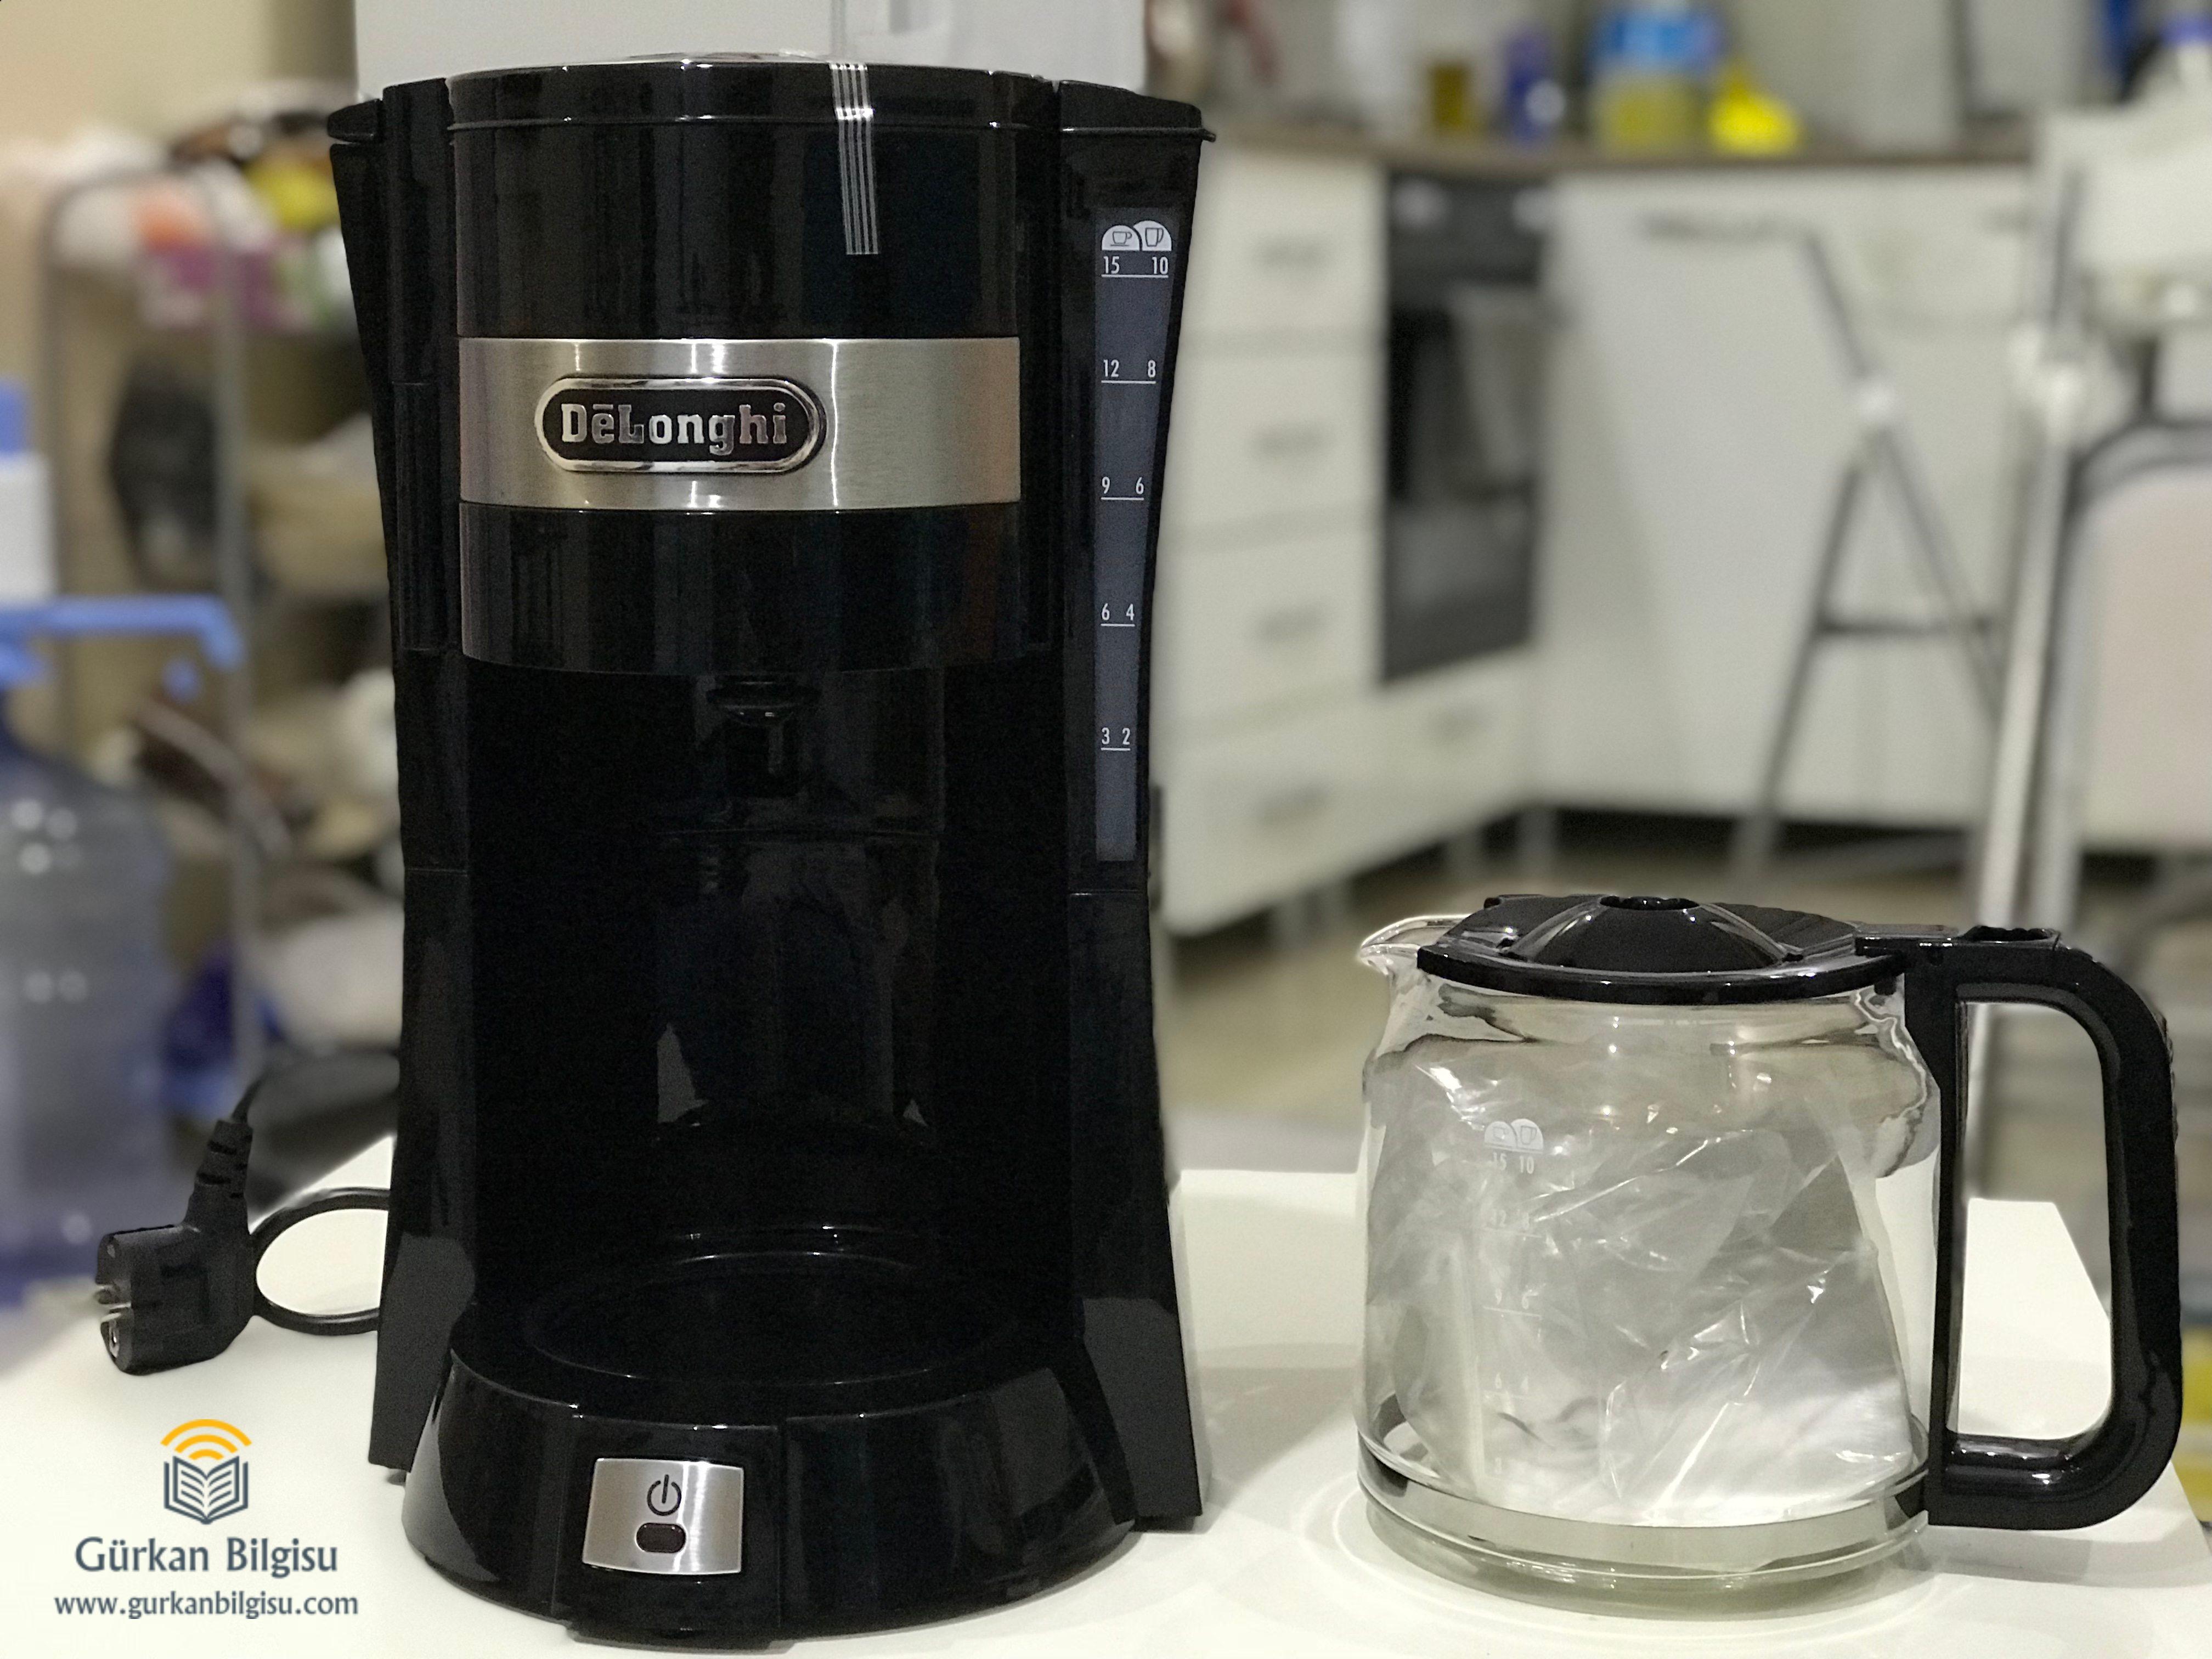 delonghi-filte-kahve-makinesi-nasil